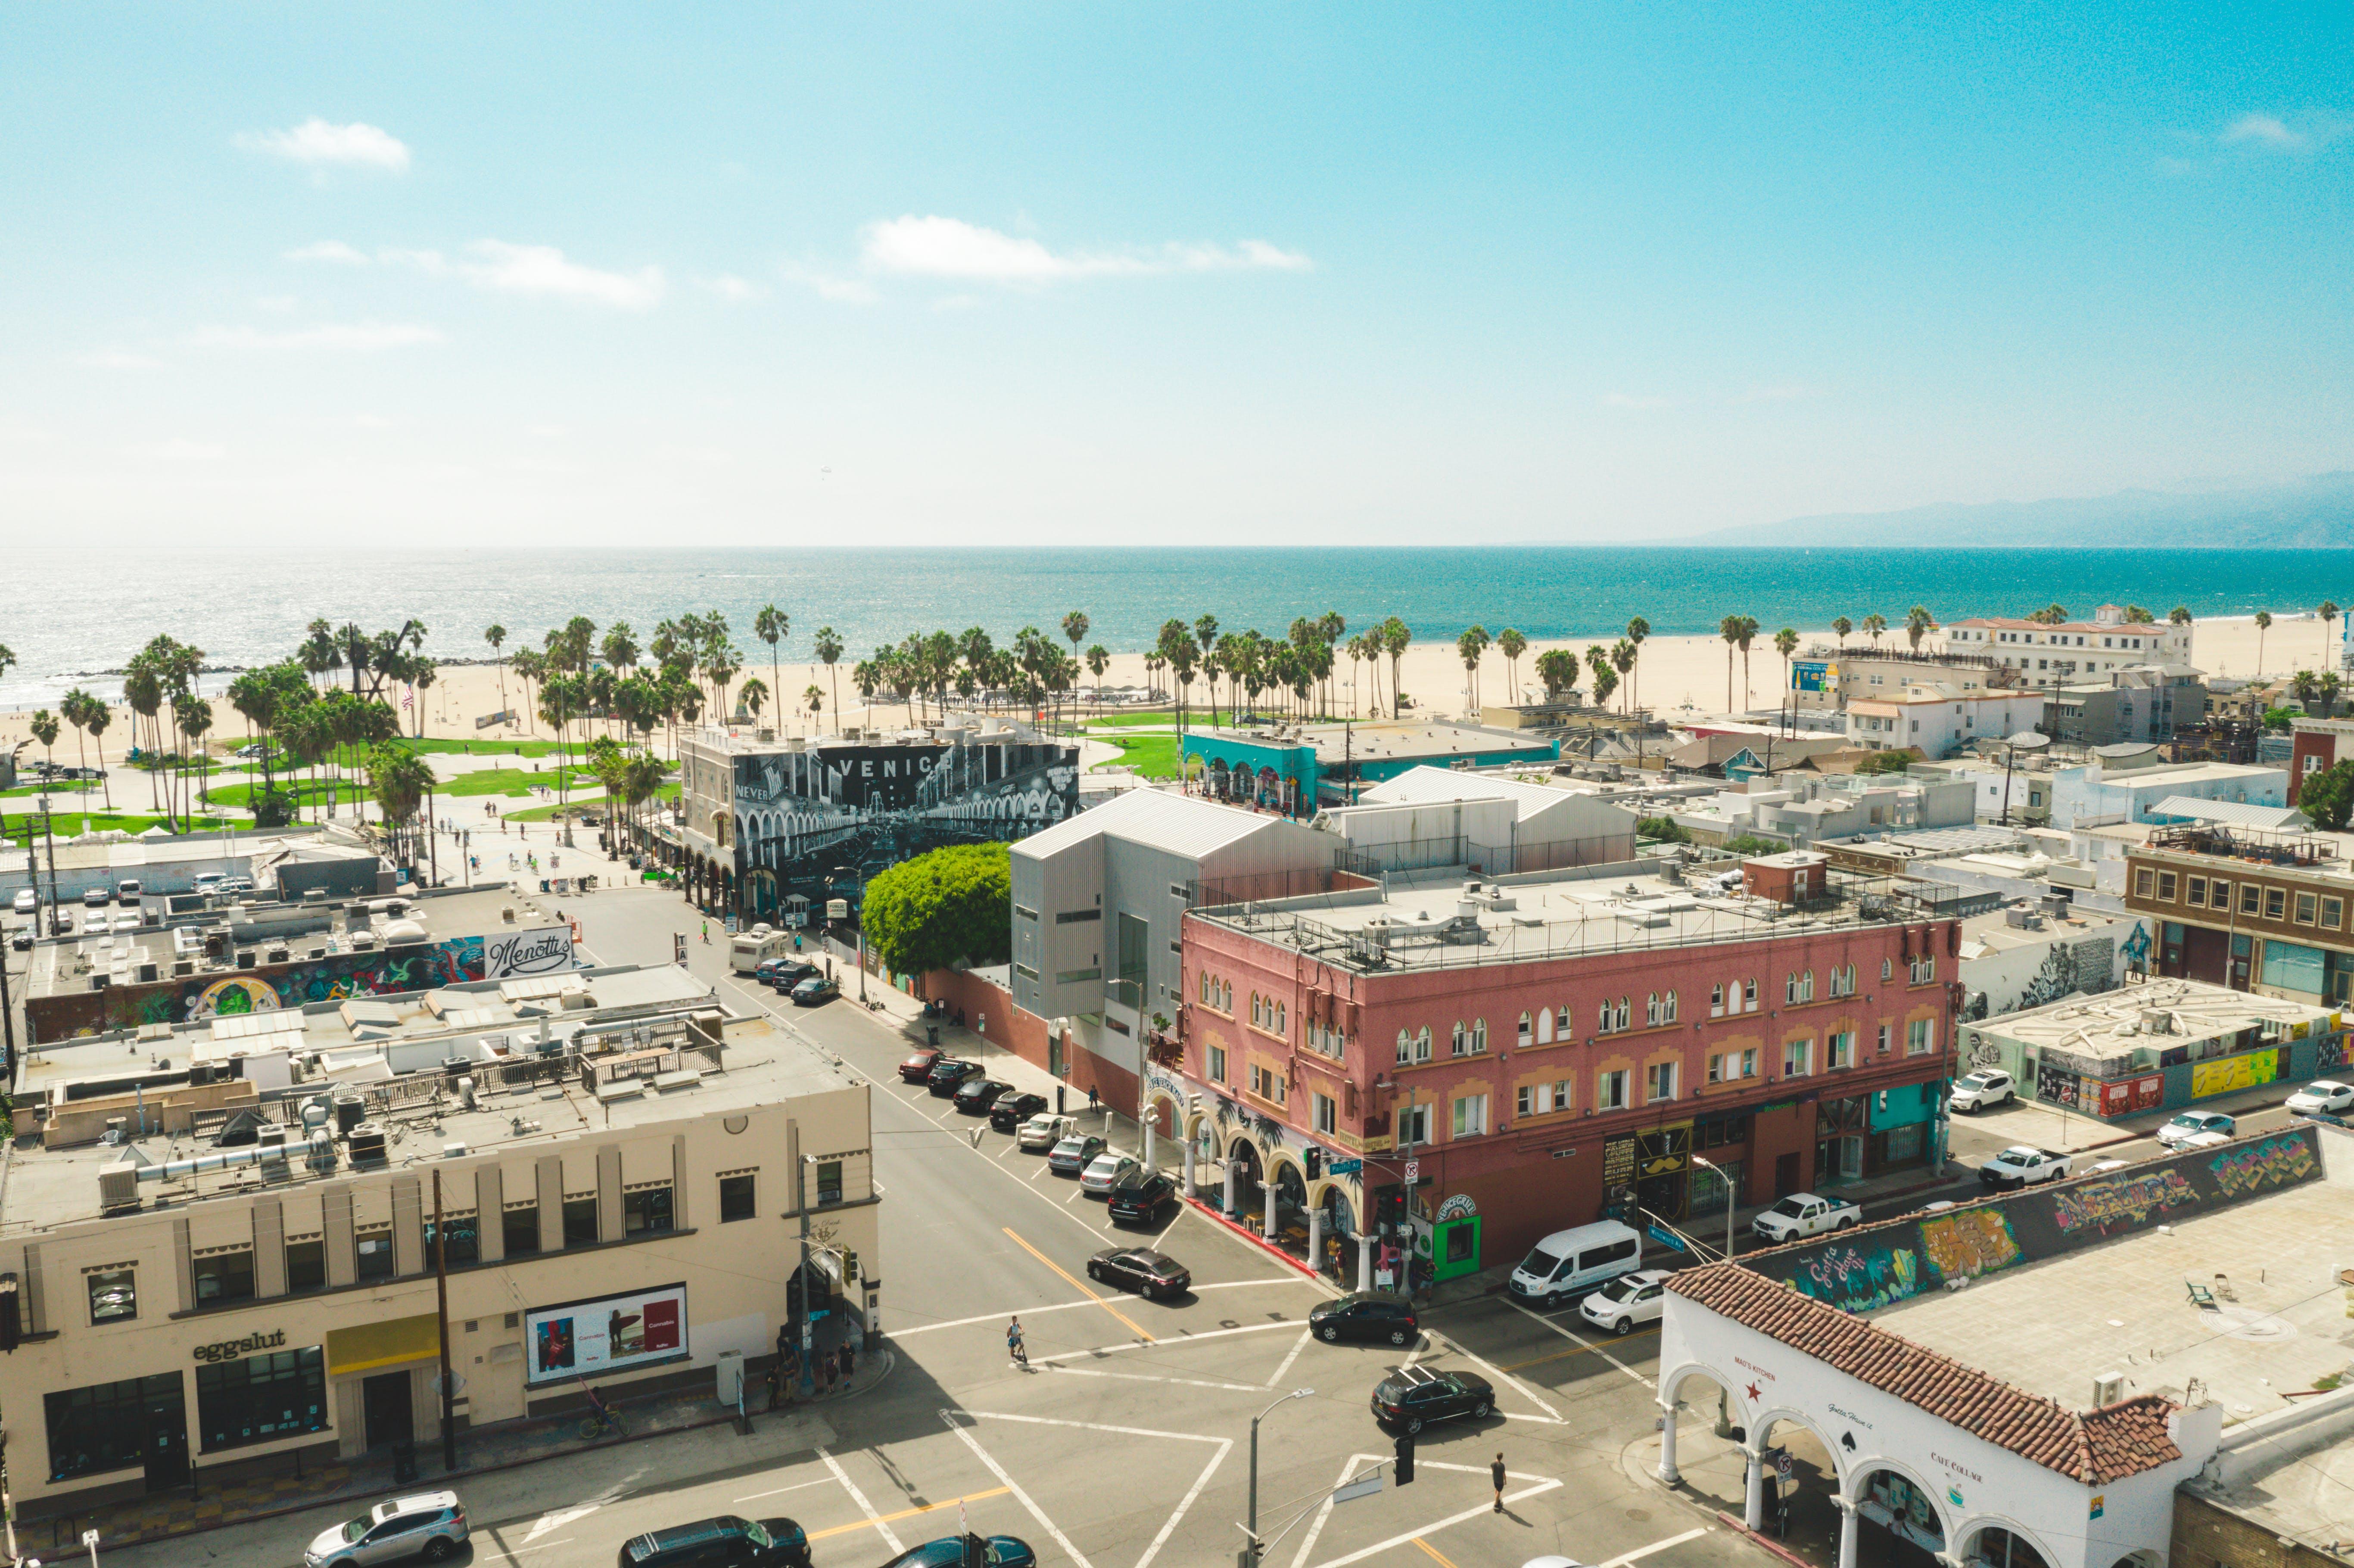 Aerial View Of Concrete Buildings Near Ocean